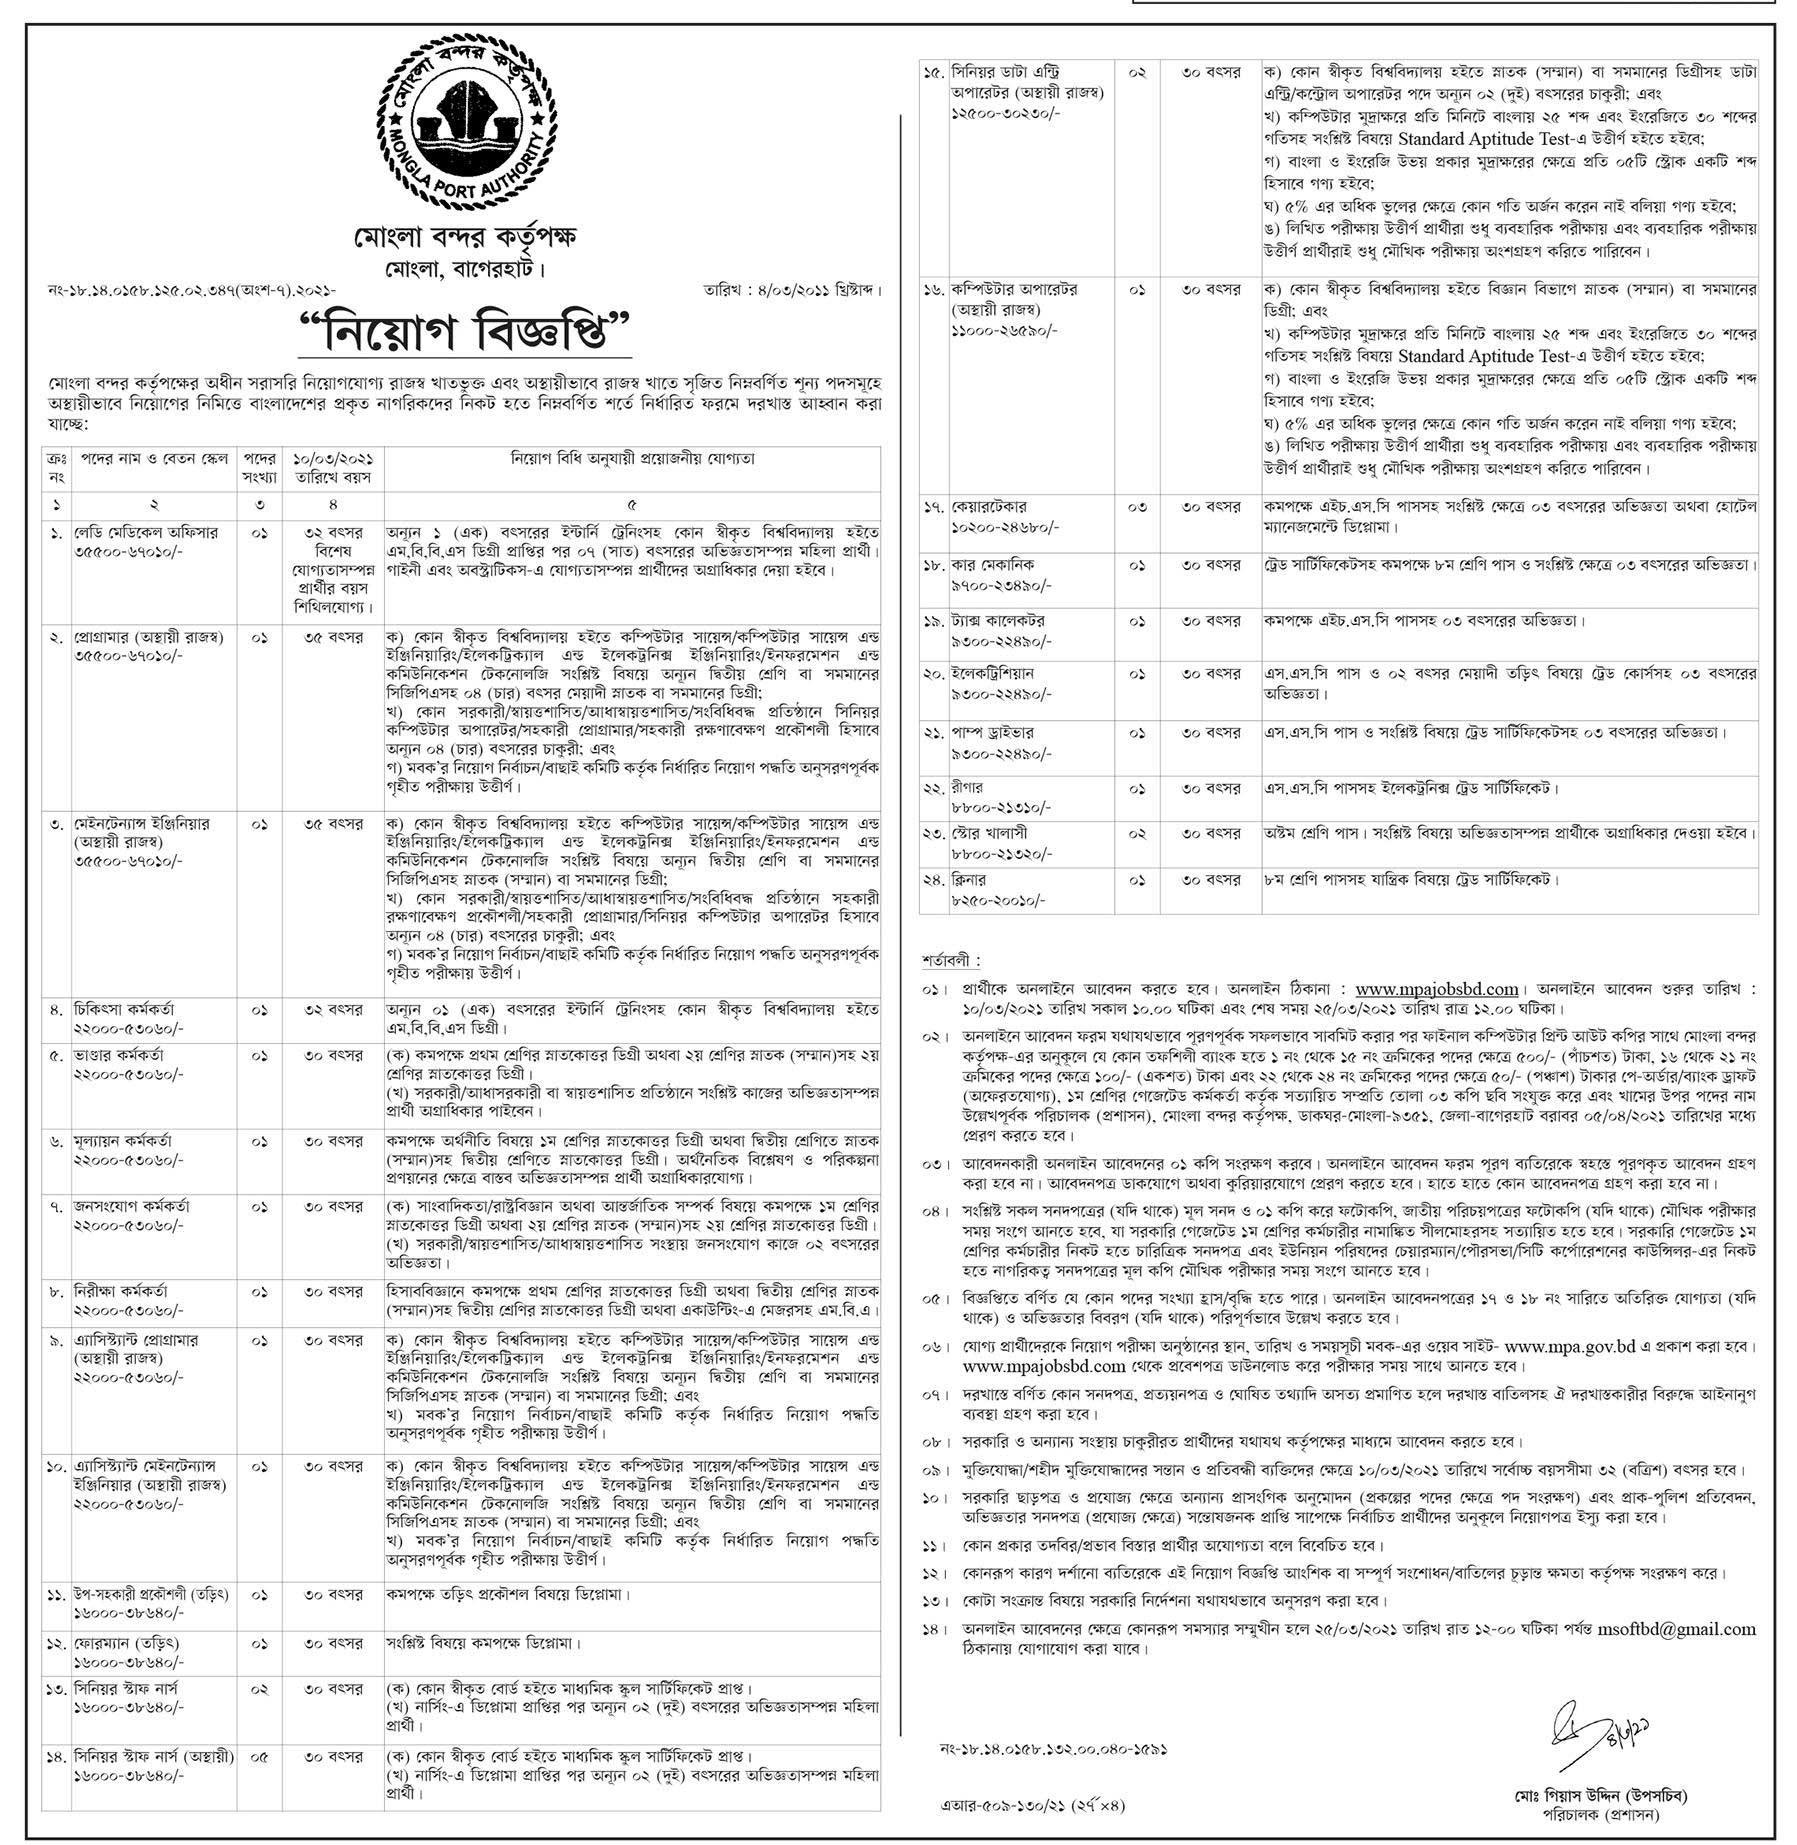 Mongla Port Authority MPA Job Circular 2021 - মোংলা বন্দর কর্তৃপক্ষ নিয়োগ বিজ্ঞপ্তি ২০২১